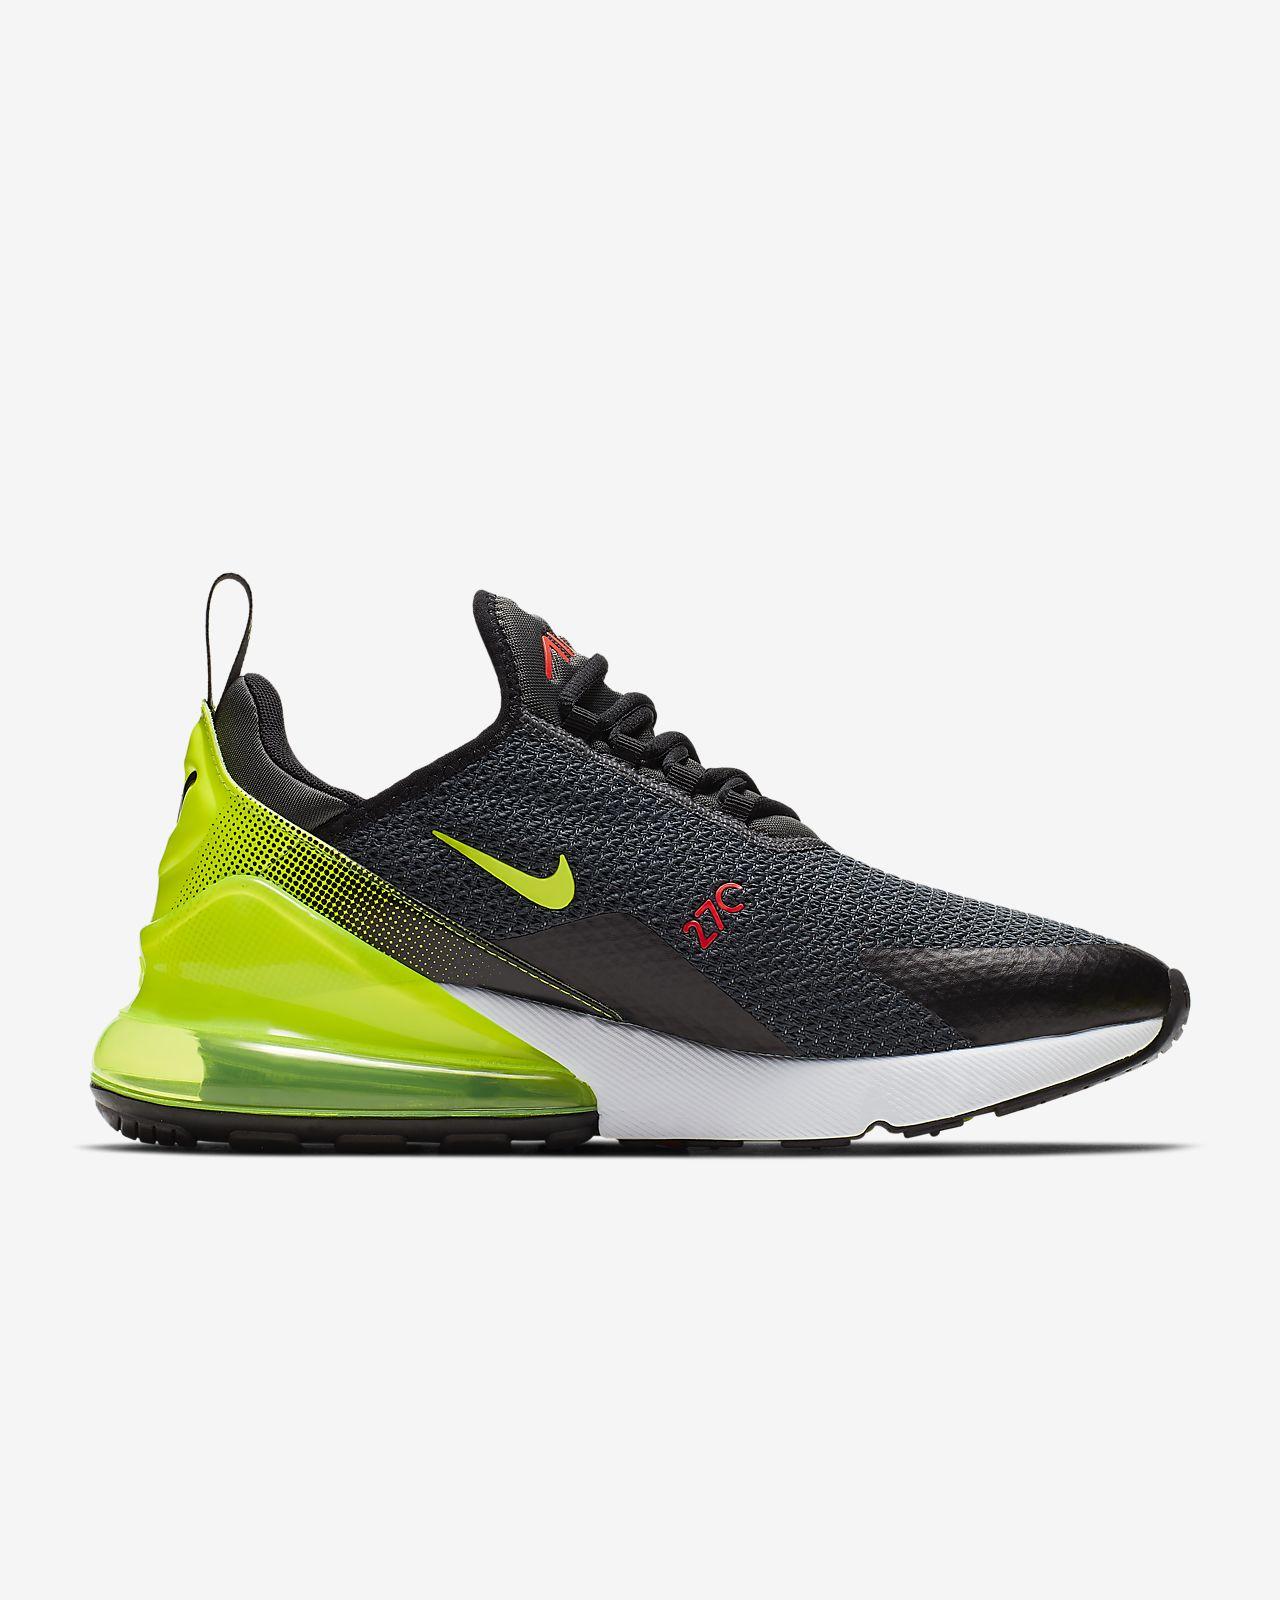 pretty nice c72fc 414c8 Nike Air Max 270 SE Men's Shoe. Nike.com AU